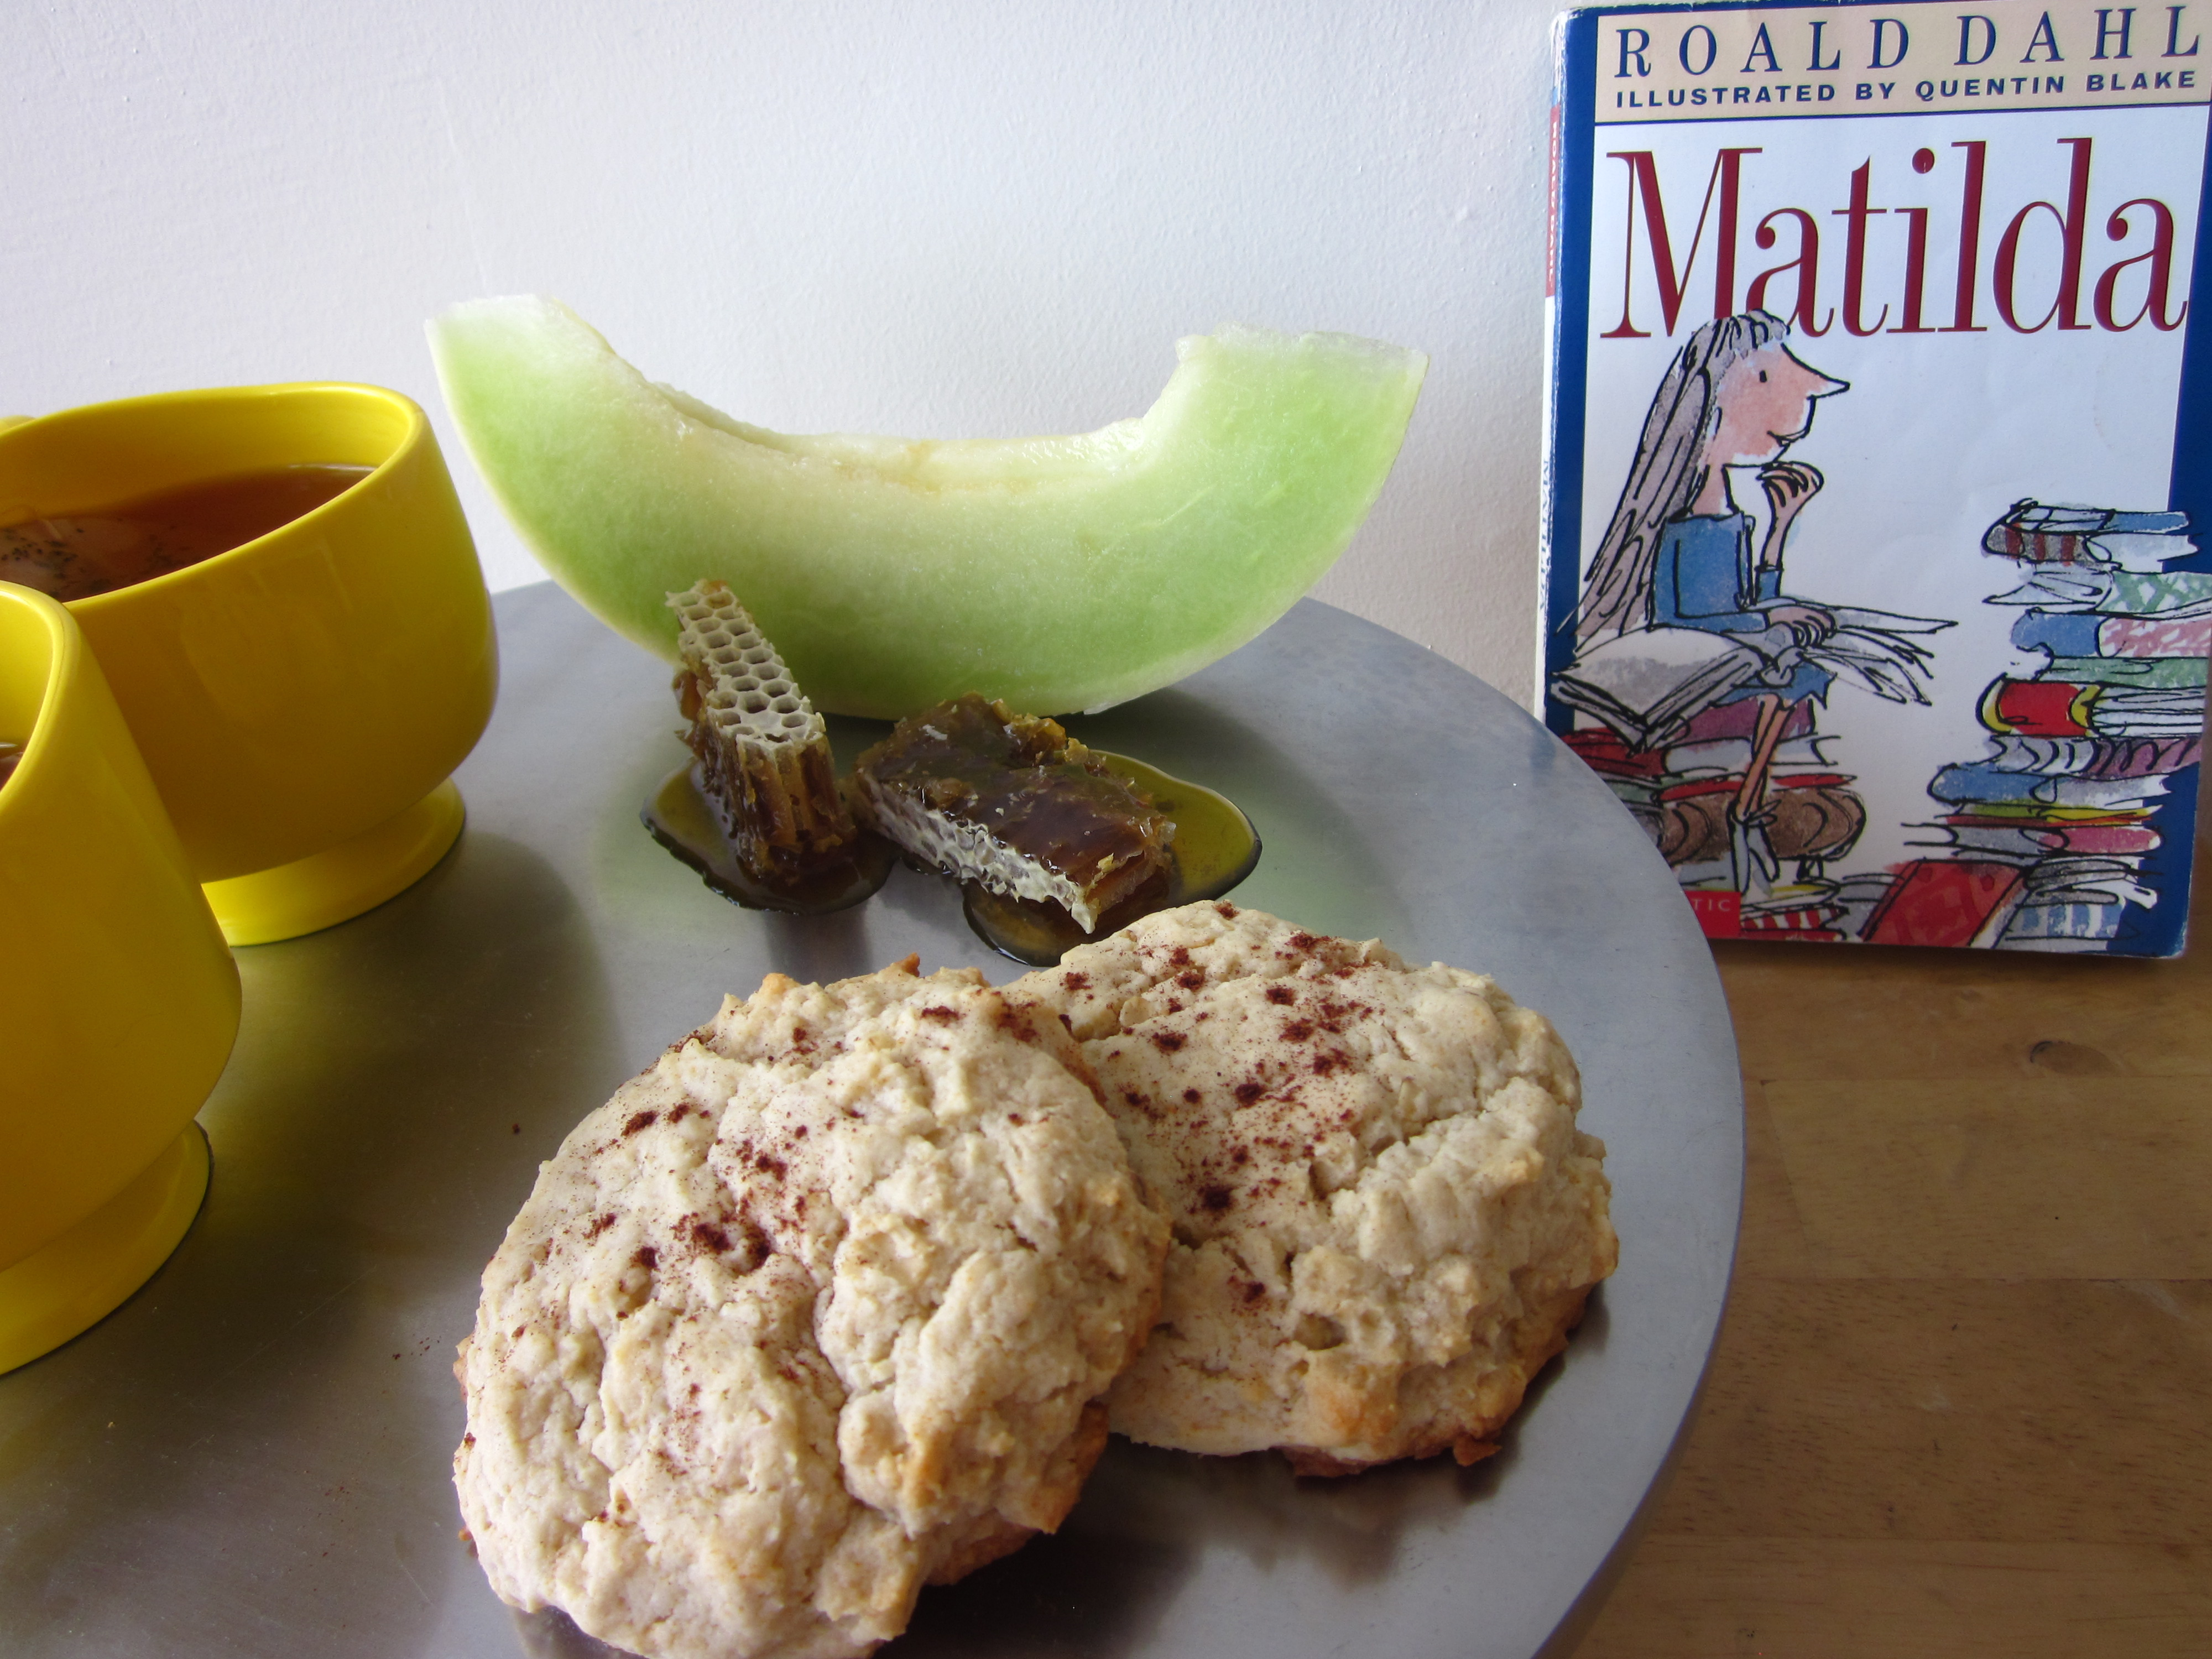 roald-dahl-quentin-blake-with-book-dessert-breakfast-food-recipe-review-honey-oatmeal-scones